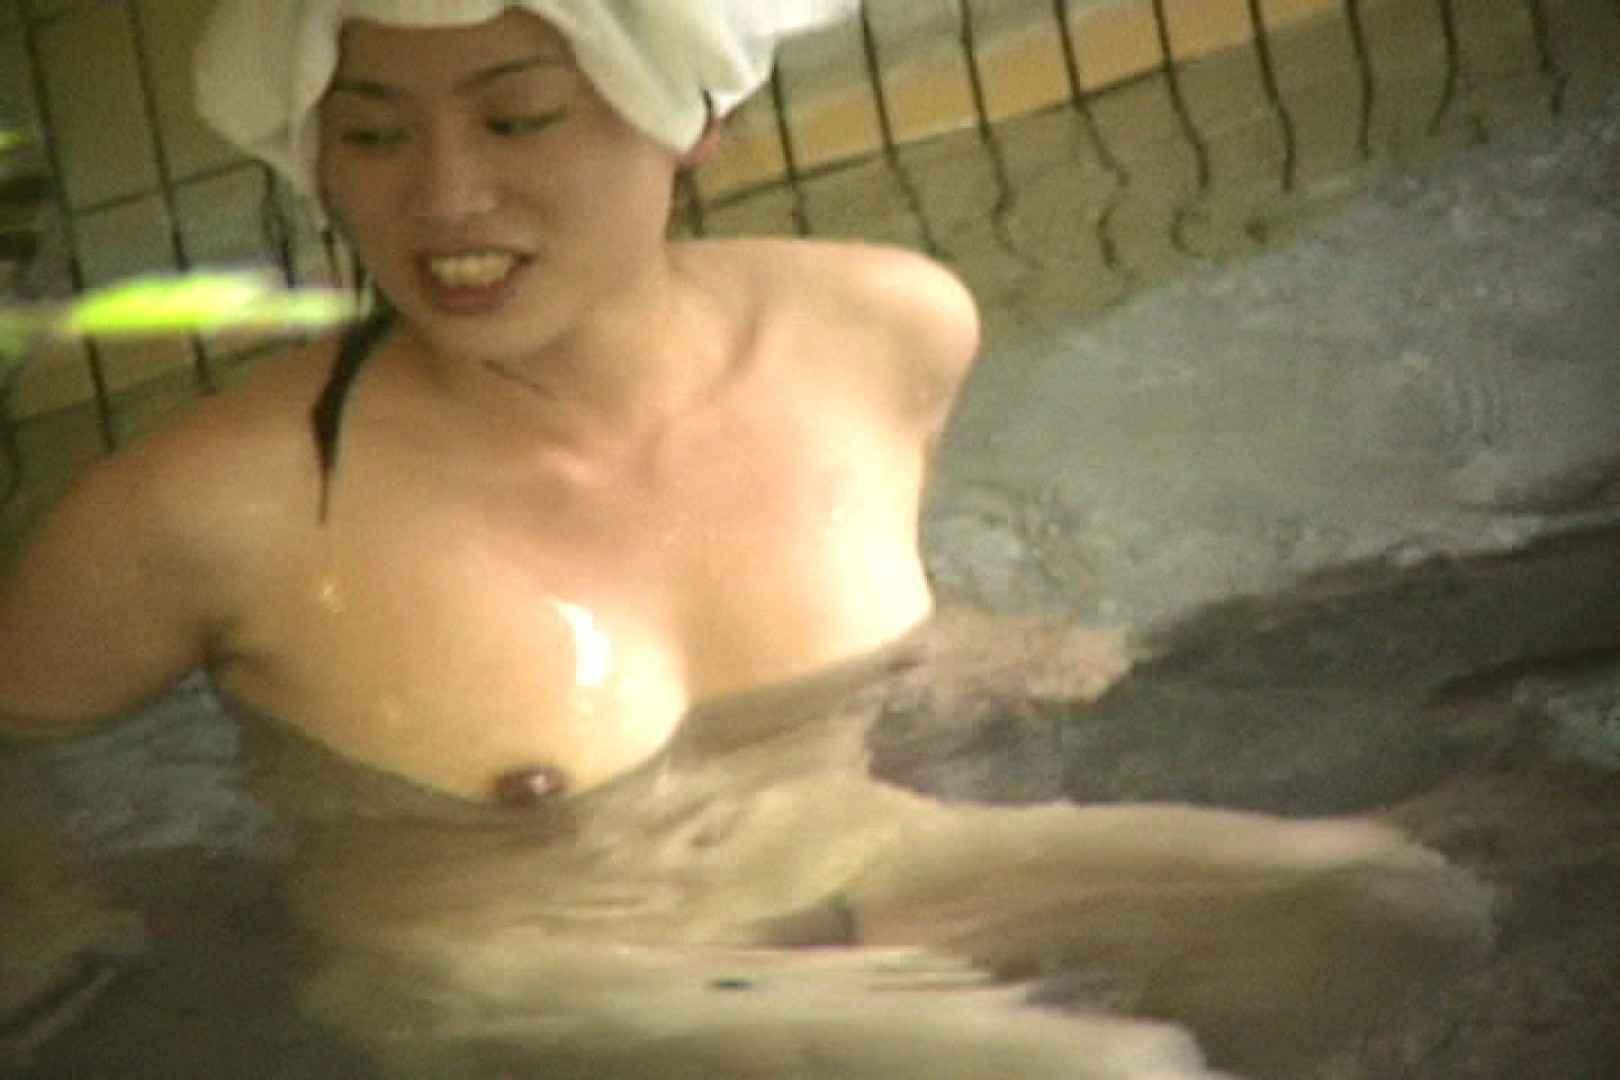 Aquaな露天風呂Vol.706 盗撮シリーズ | 露天風呂編  106PIX 37